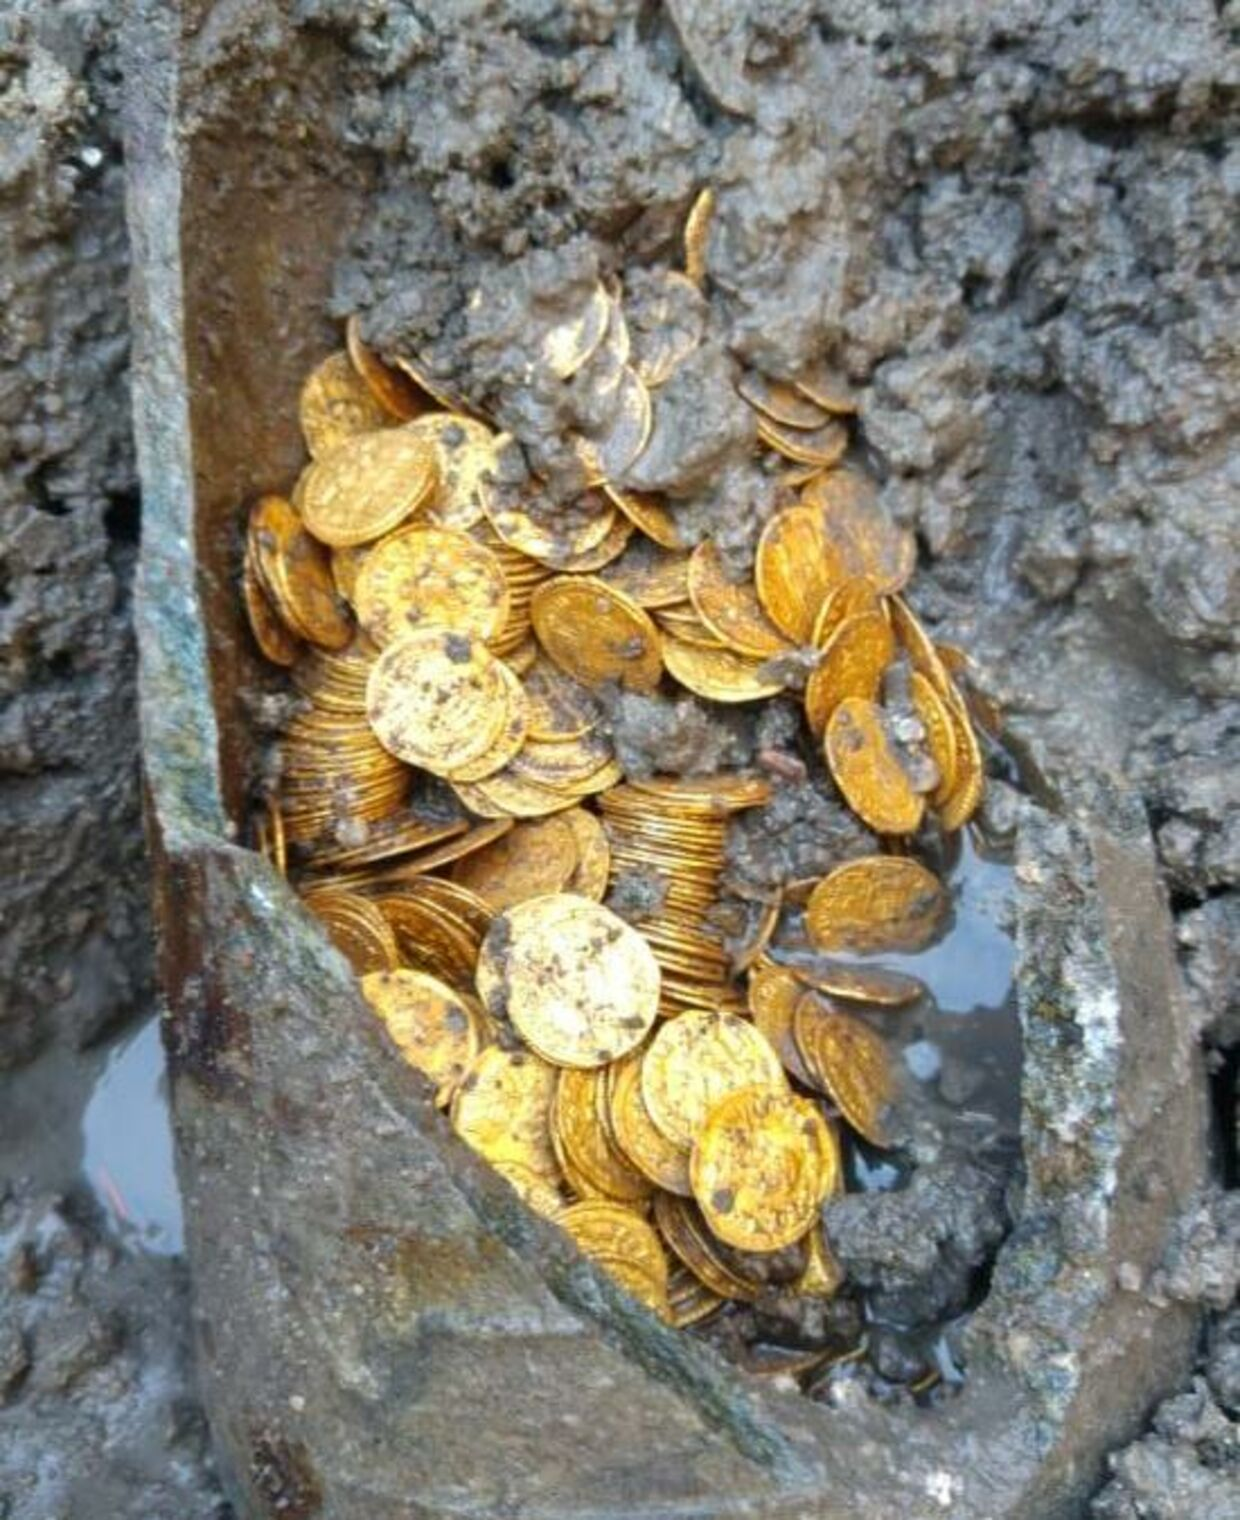 Der er flere hundrede mønter i krukken.